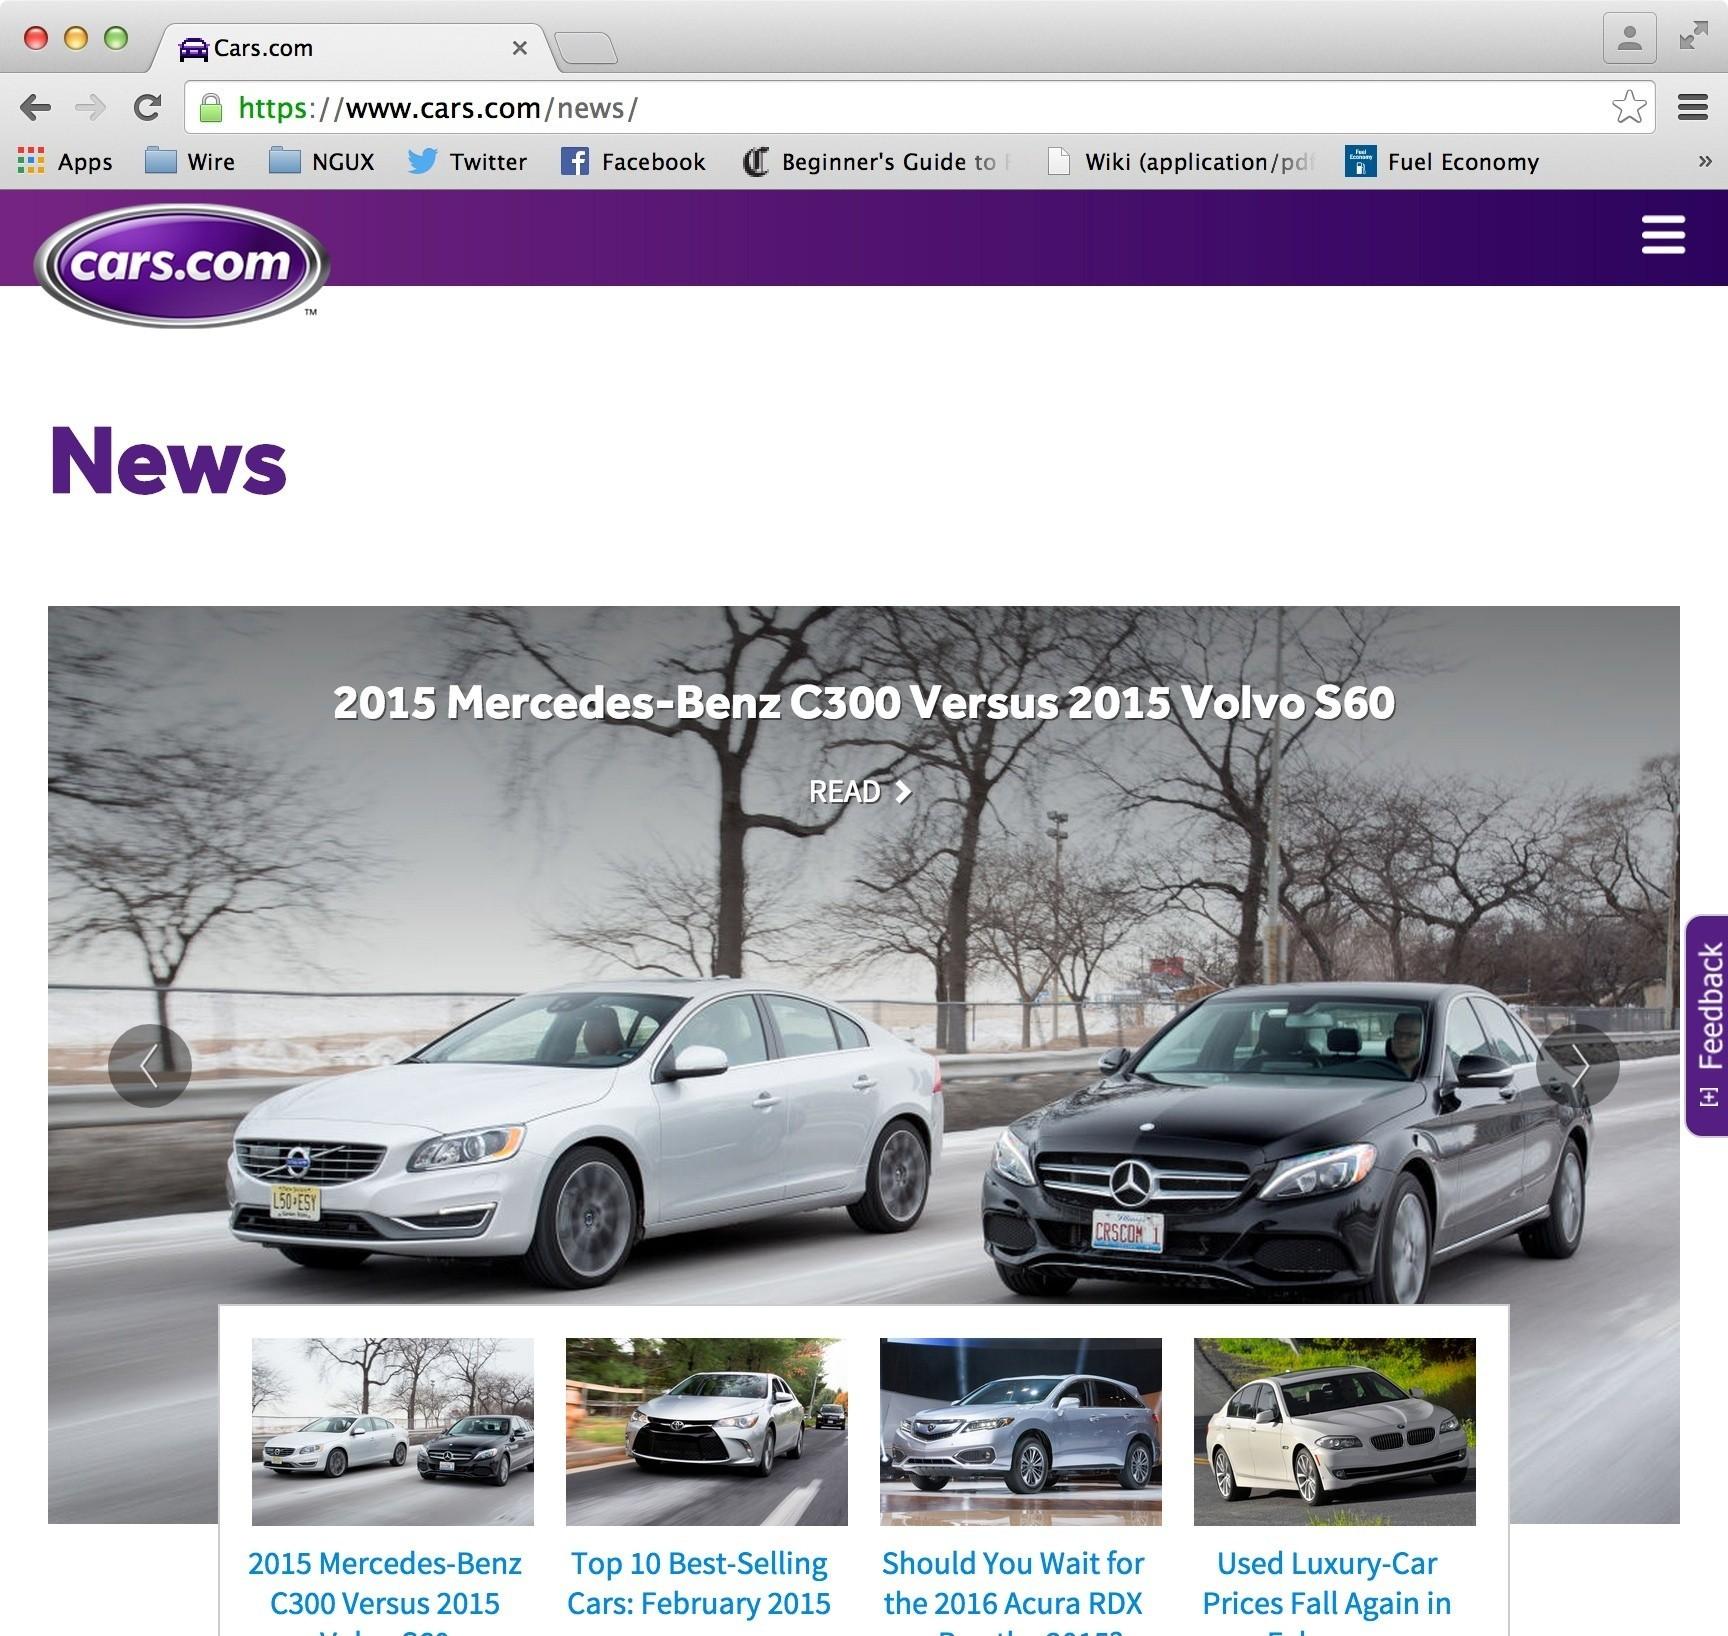 Cars.com unveils new website, better experience - Chicago Tribune